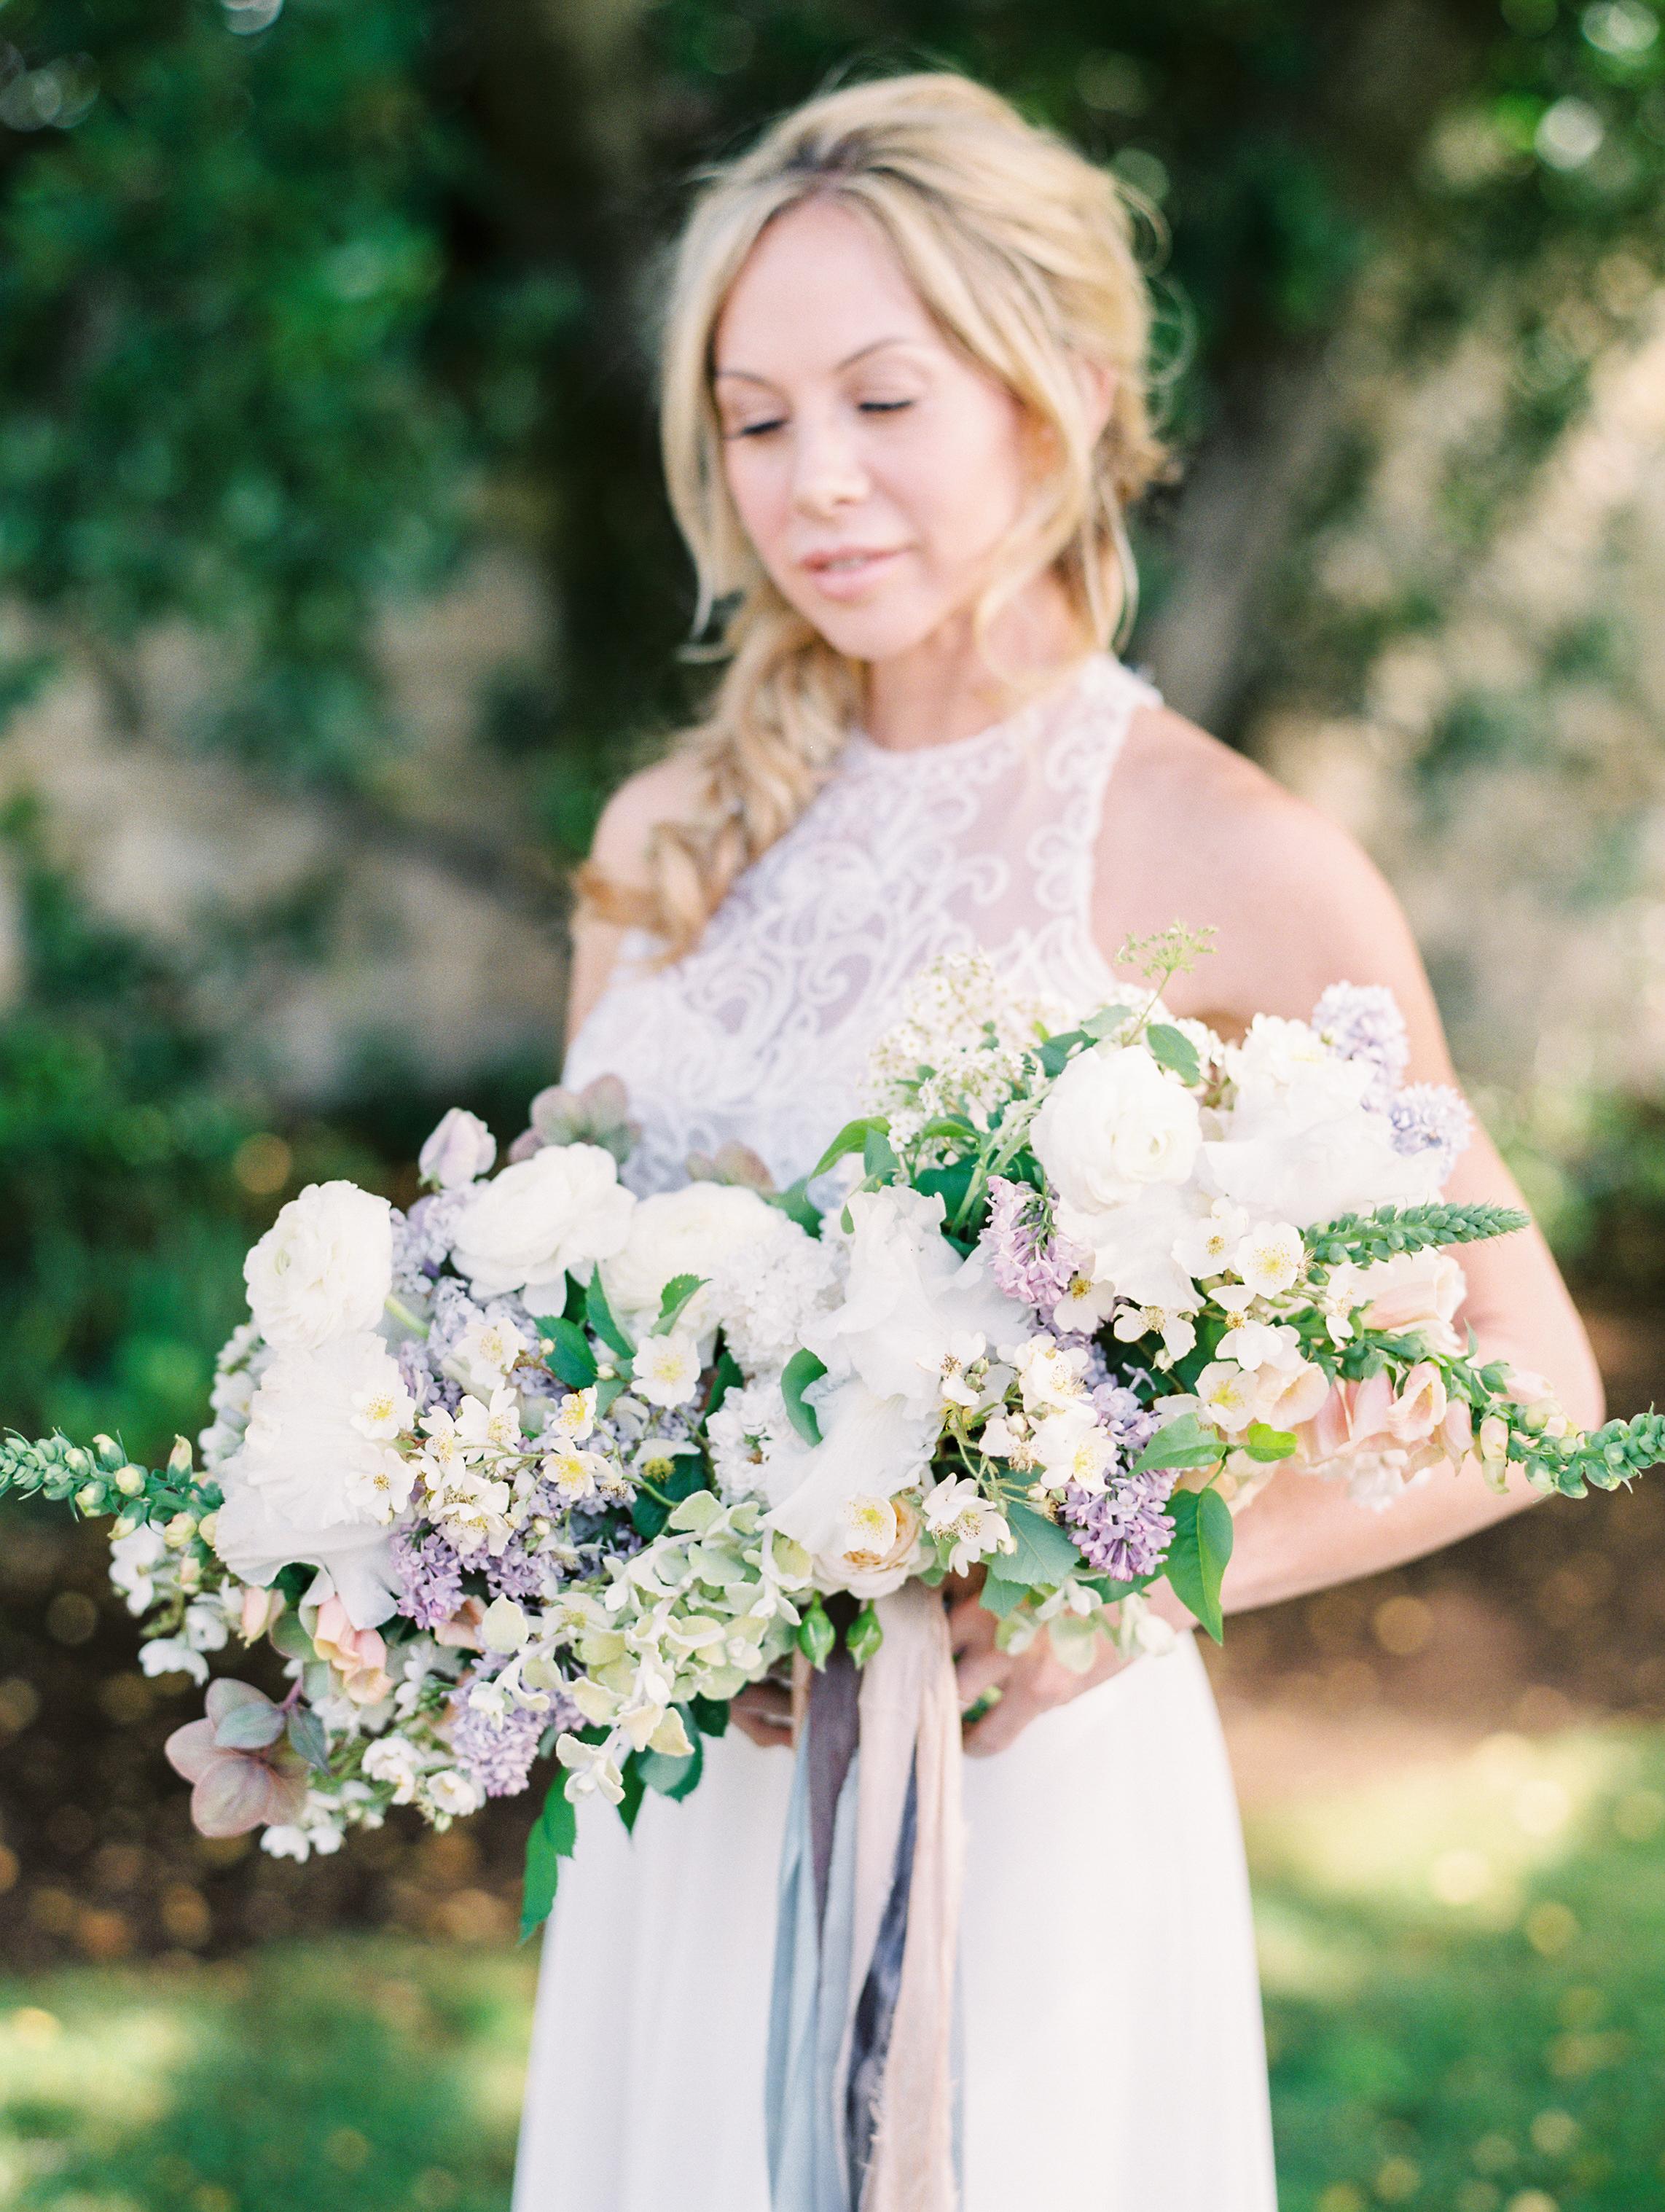 holman+ranch+wedding+bloom+workshop-21.jpg